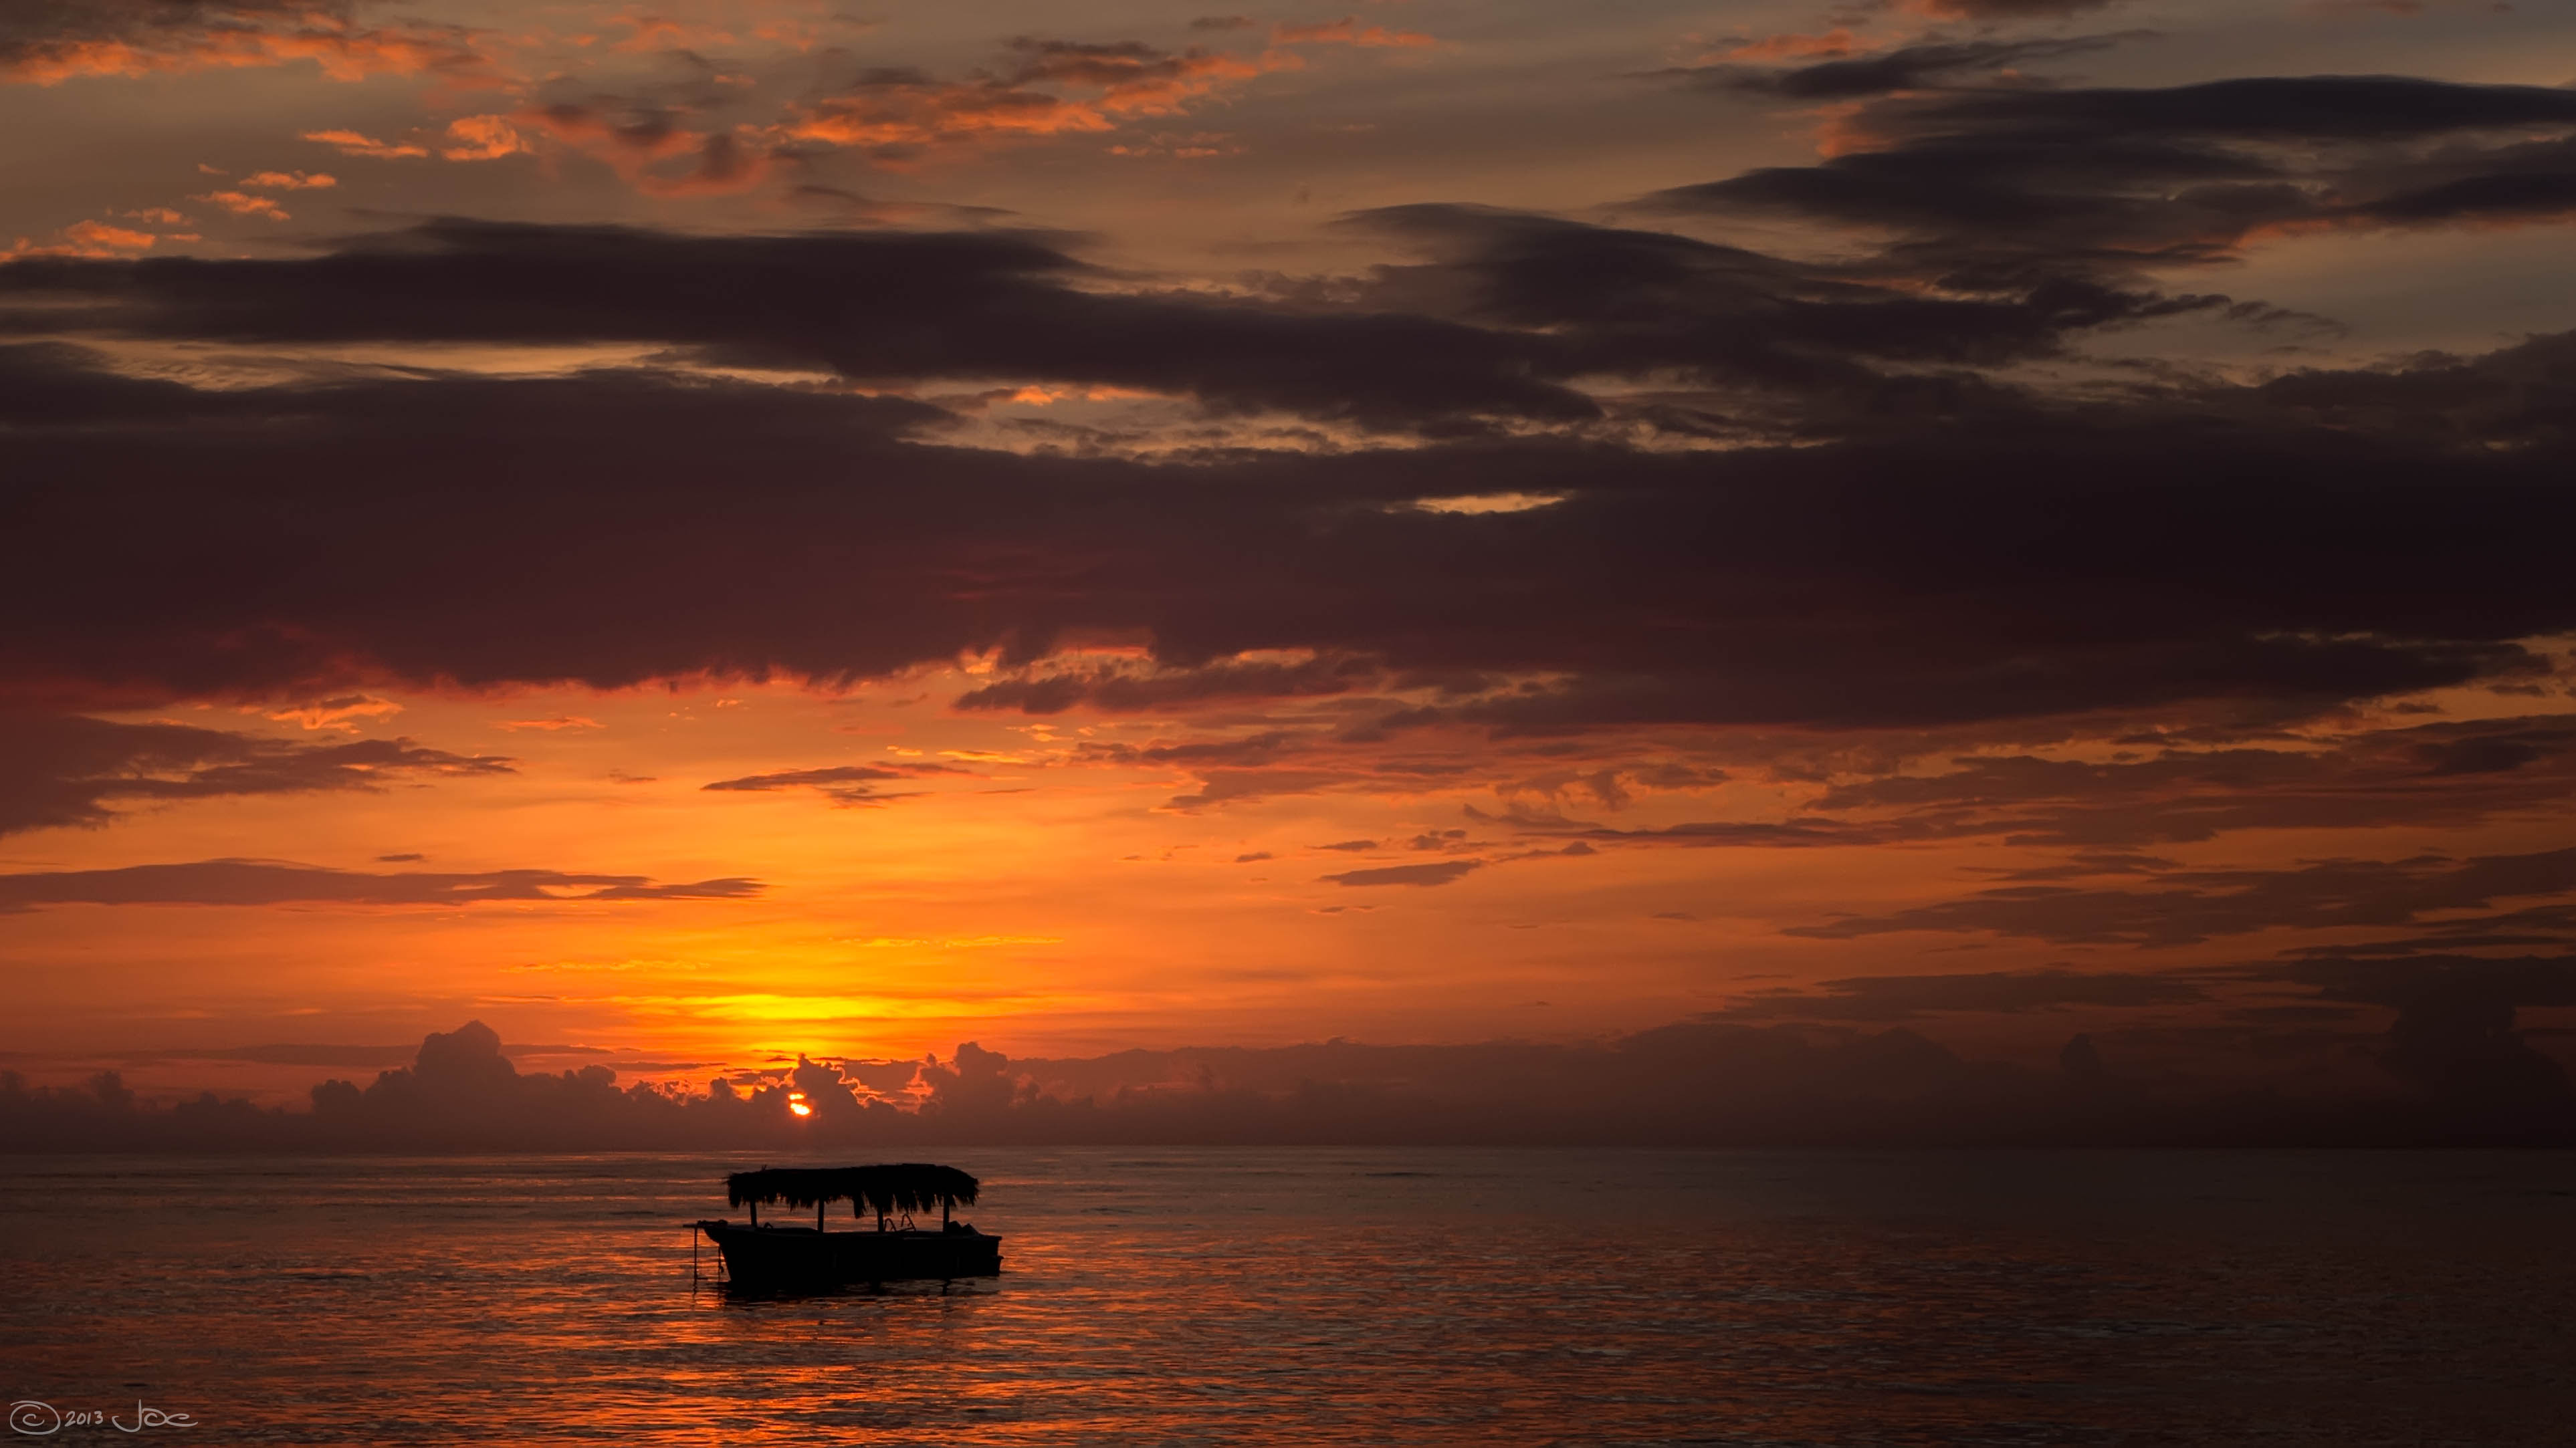 Sunrise, punta cana, dominican republic photo